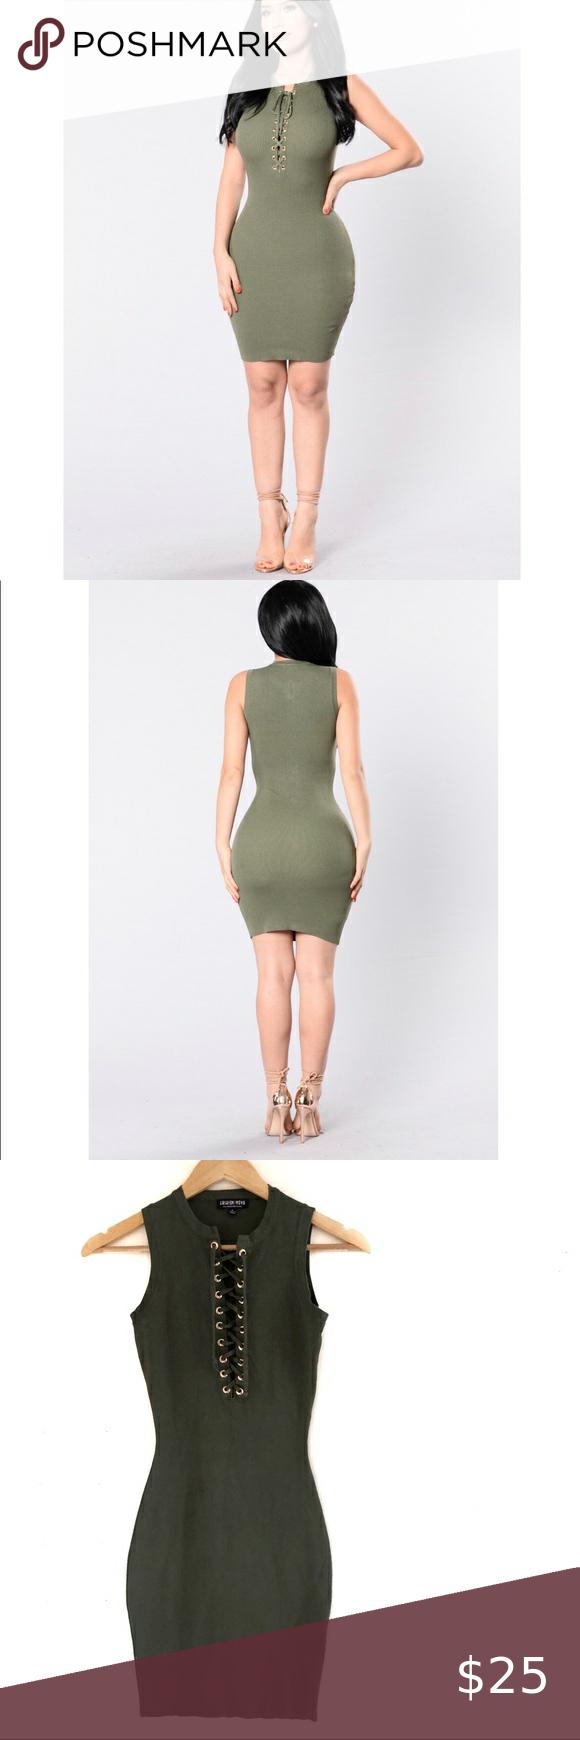 Fashion nova bodycon dress questions and answers